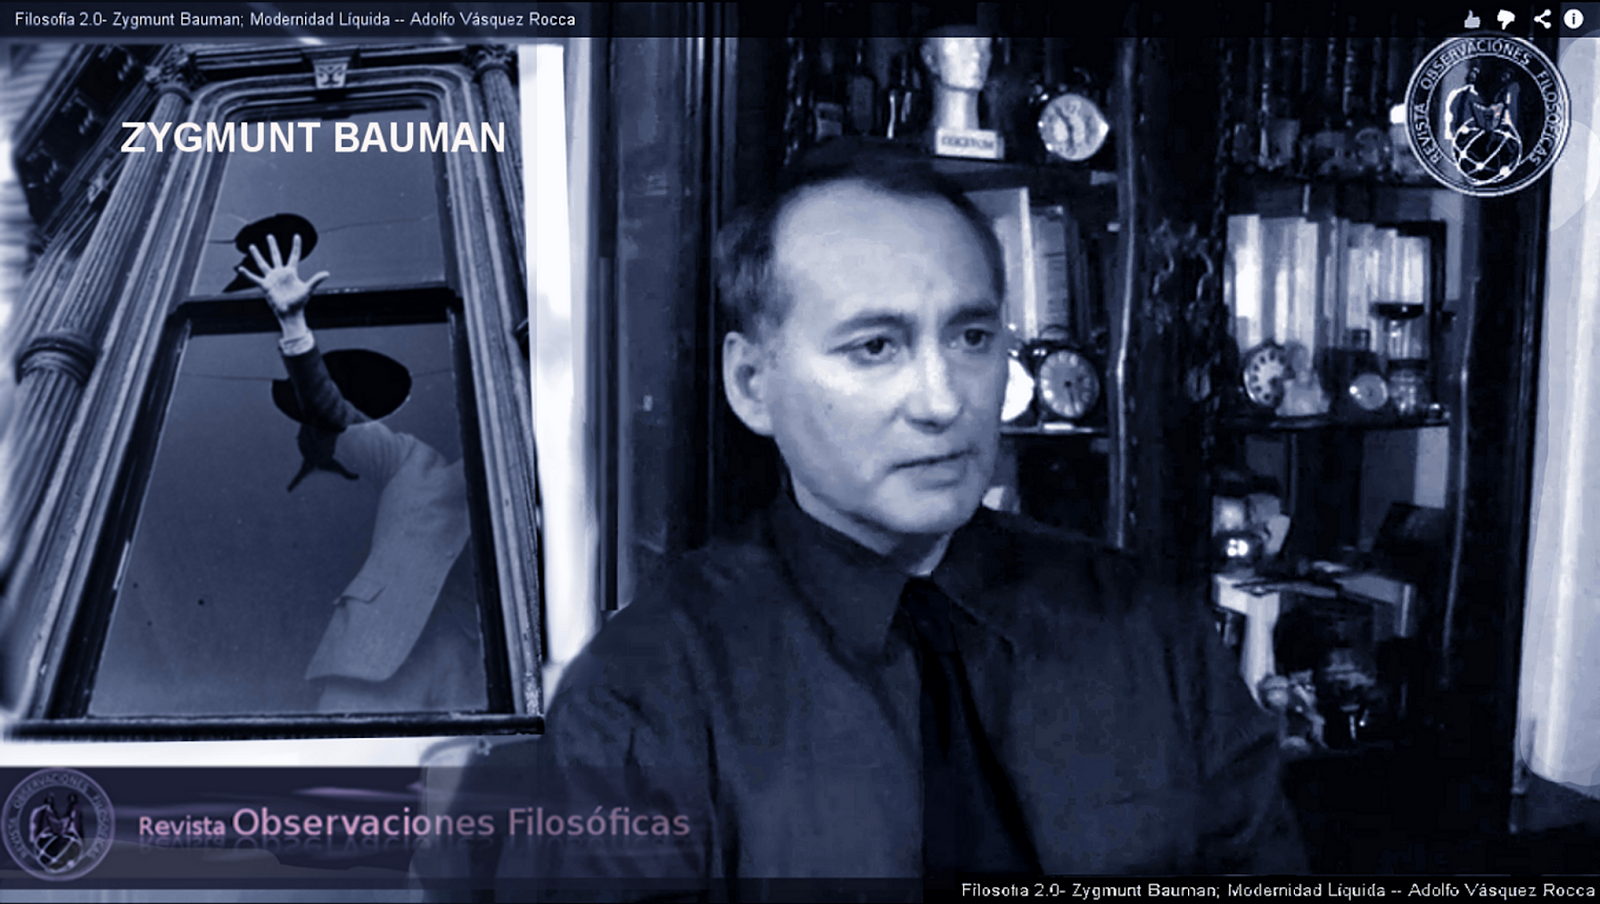 http://3.bp.blogspot.com/-b5GIXZGEiEM/UtryCwNX_SI/AAAAAAAANU8/vqALnJDQ5Co/s1600/Video+Conferencia+_+BAUMAN+ZIGMUNT+_++Blue+ROF+Logo+70XL+_+Modernidad+Liquida+_+ADOLFO+VASQUEZ+ROCCA+D.Phil.png